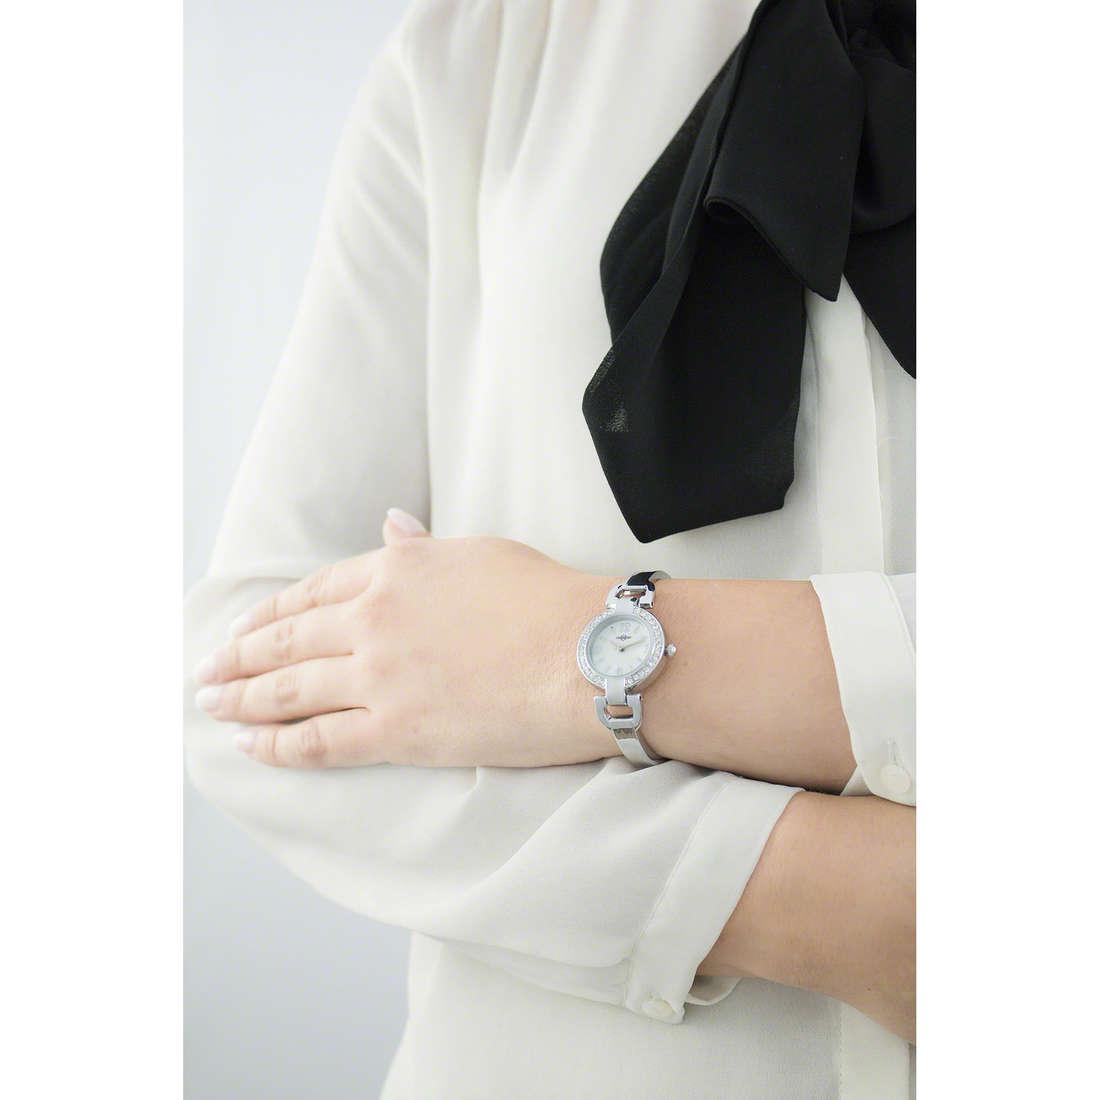 Chronostar seul le temps Venere femme R3753156501 indosso